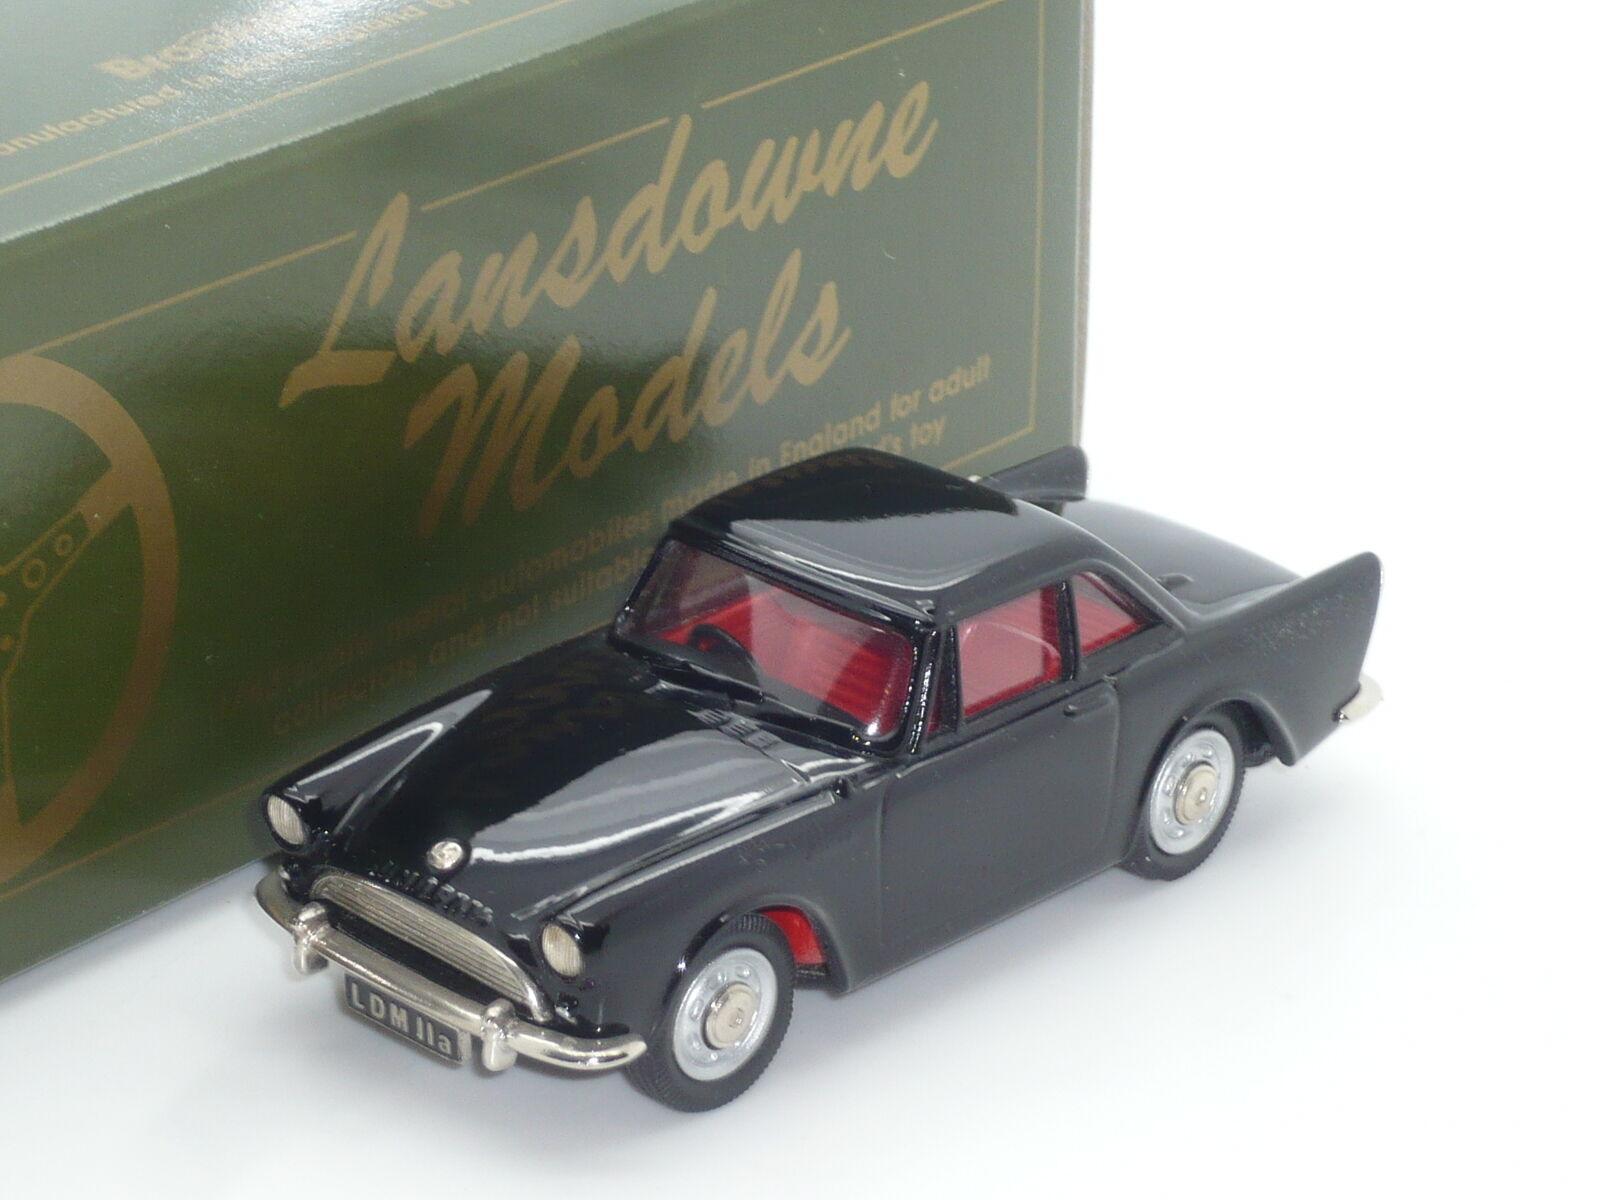 ¡no ser extrañado! Nuevo 1 43 Lansdowne Modelos LDM11A 1963 Sunbeam Sunbeam Sunbeam Alpine III HANDBUILT Brooklin  de moda